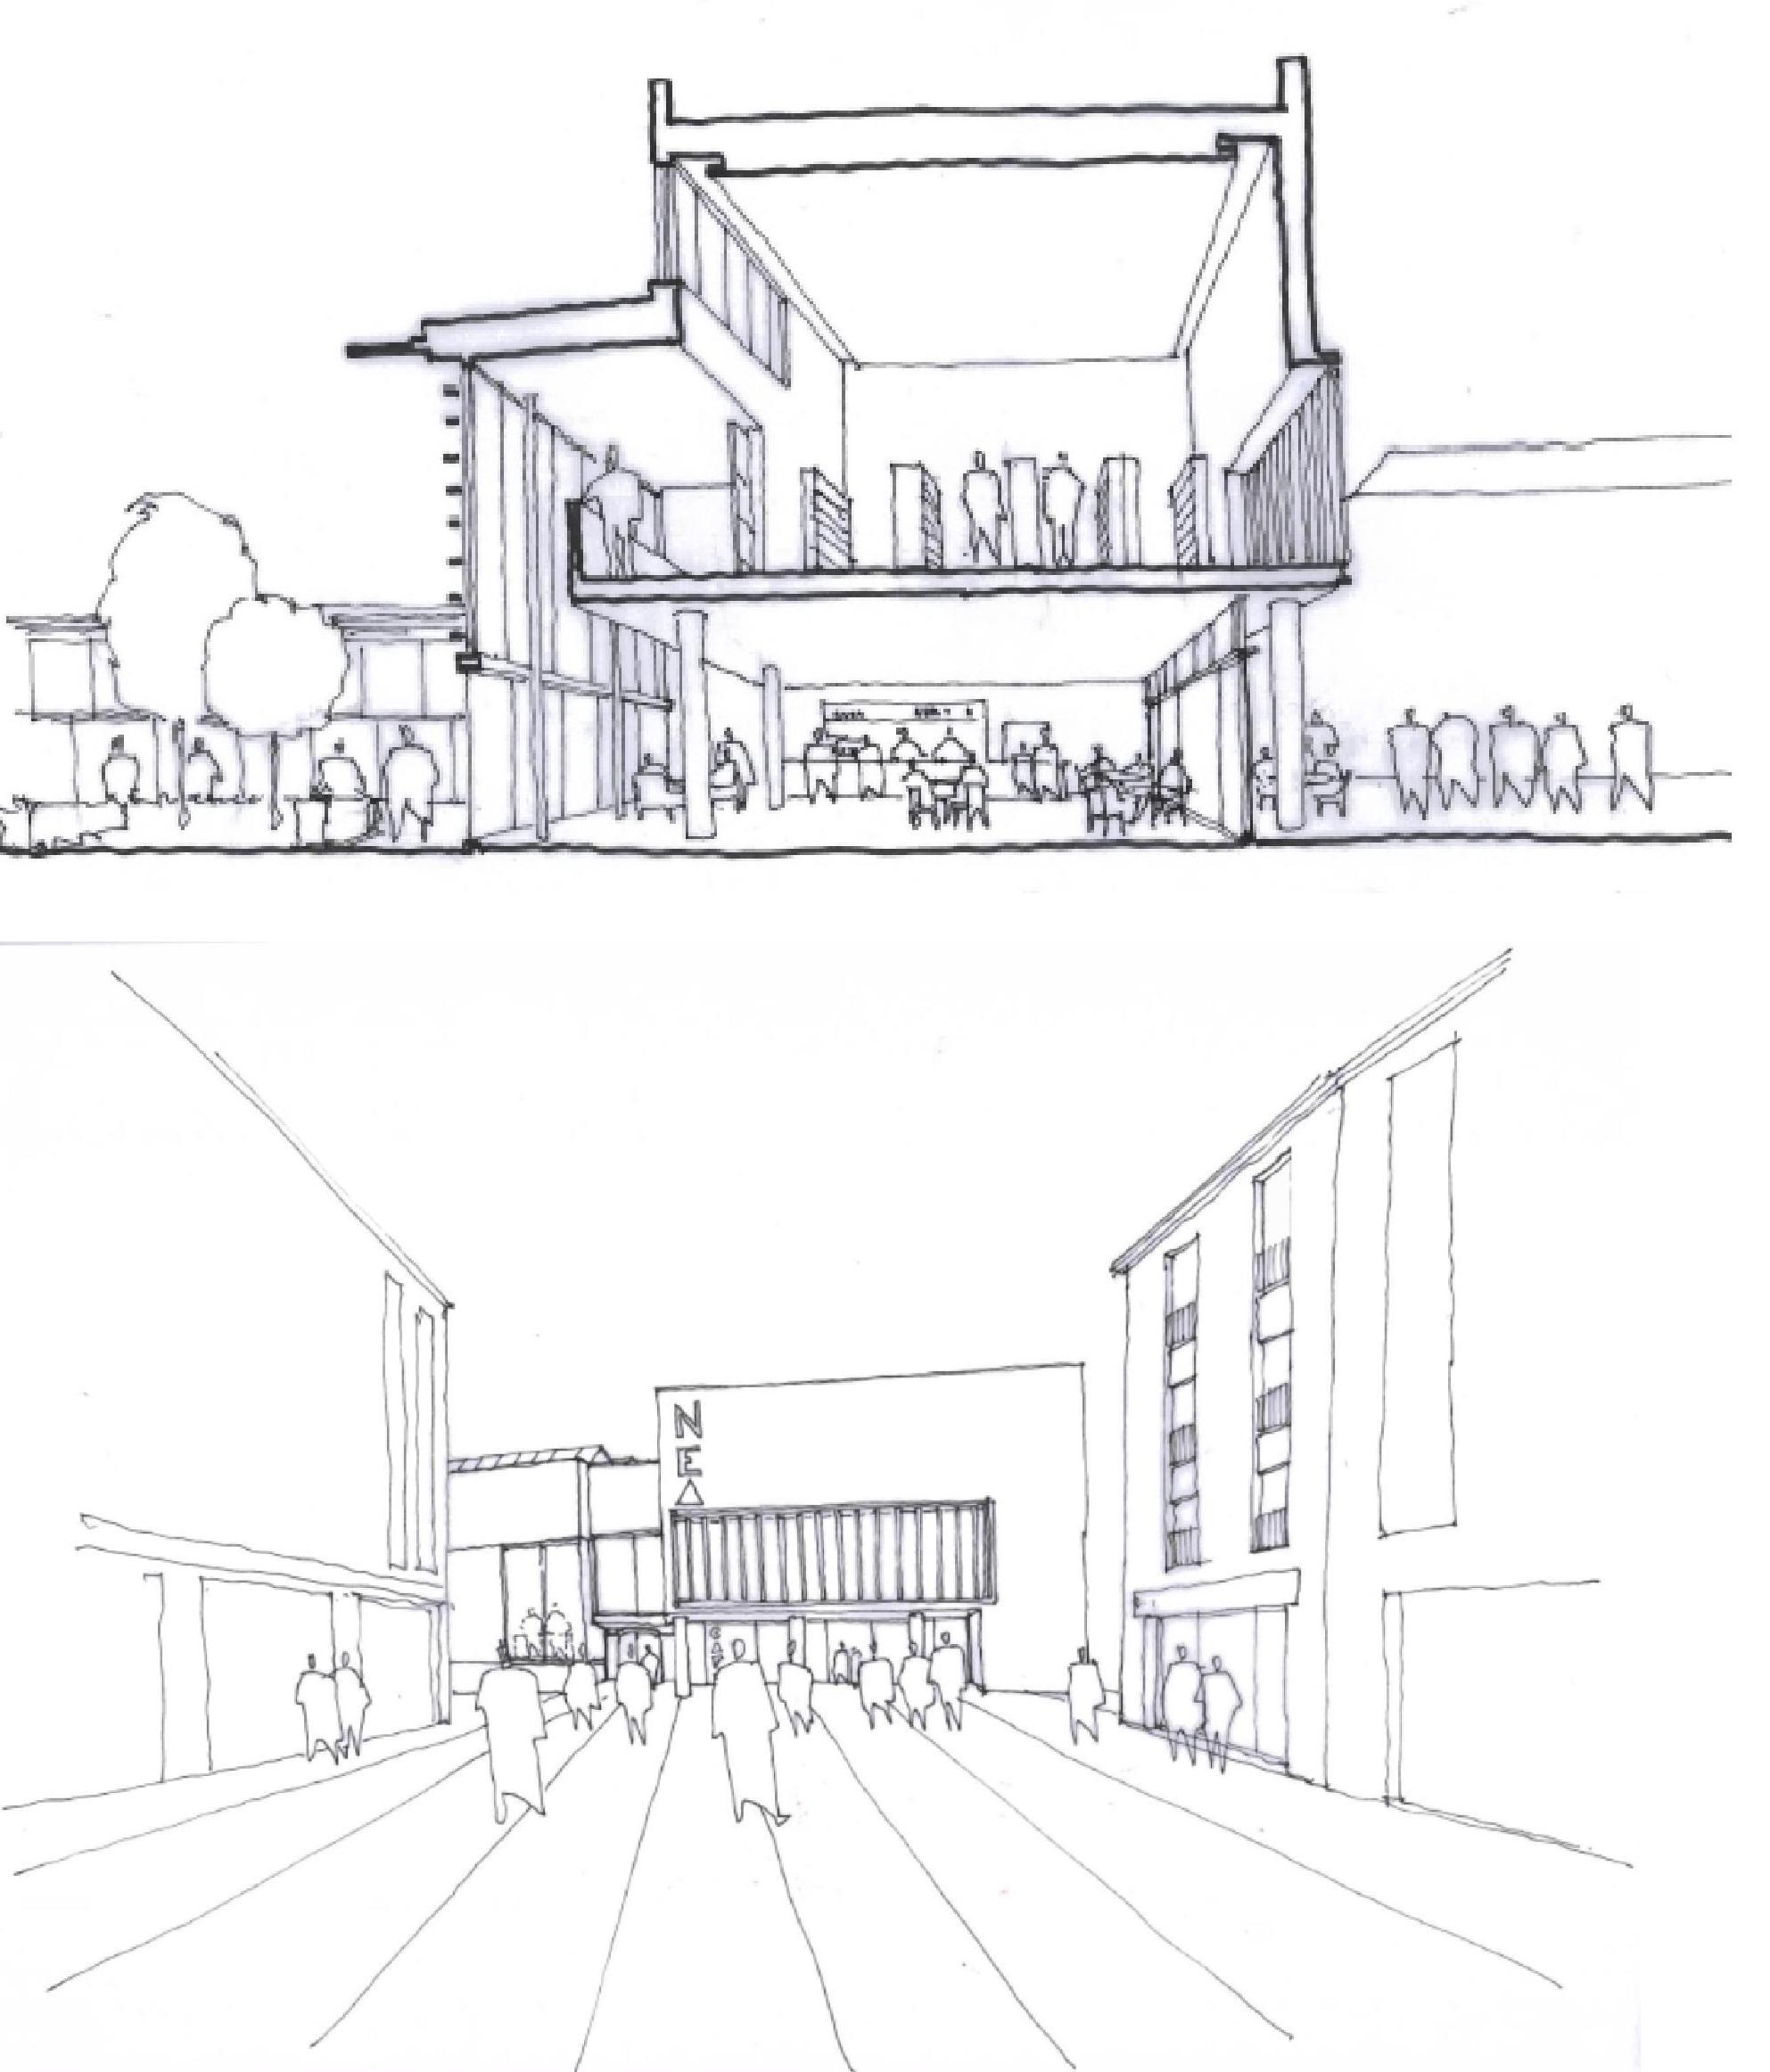 Architect Sketch -Richard Murphy Architects